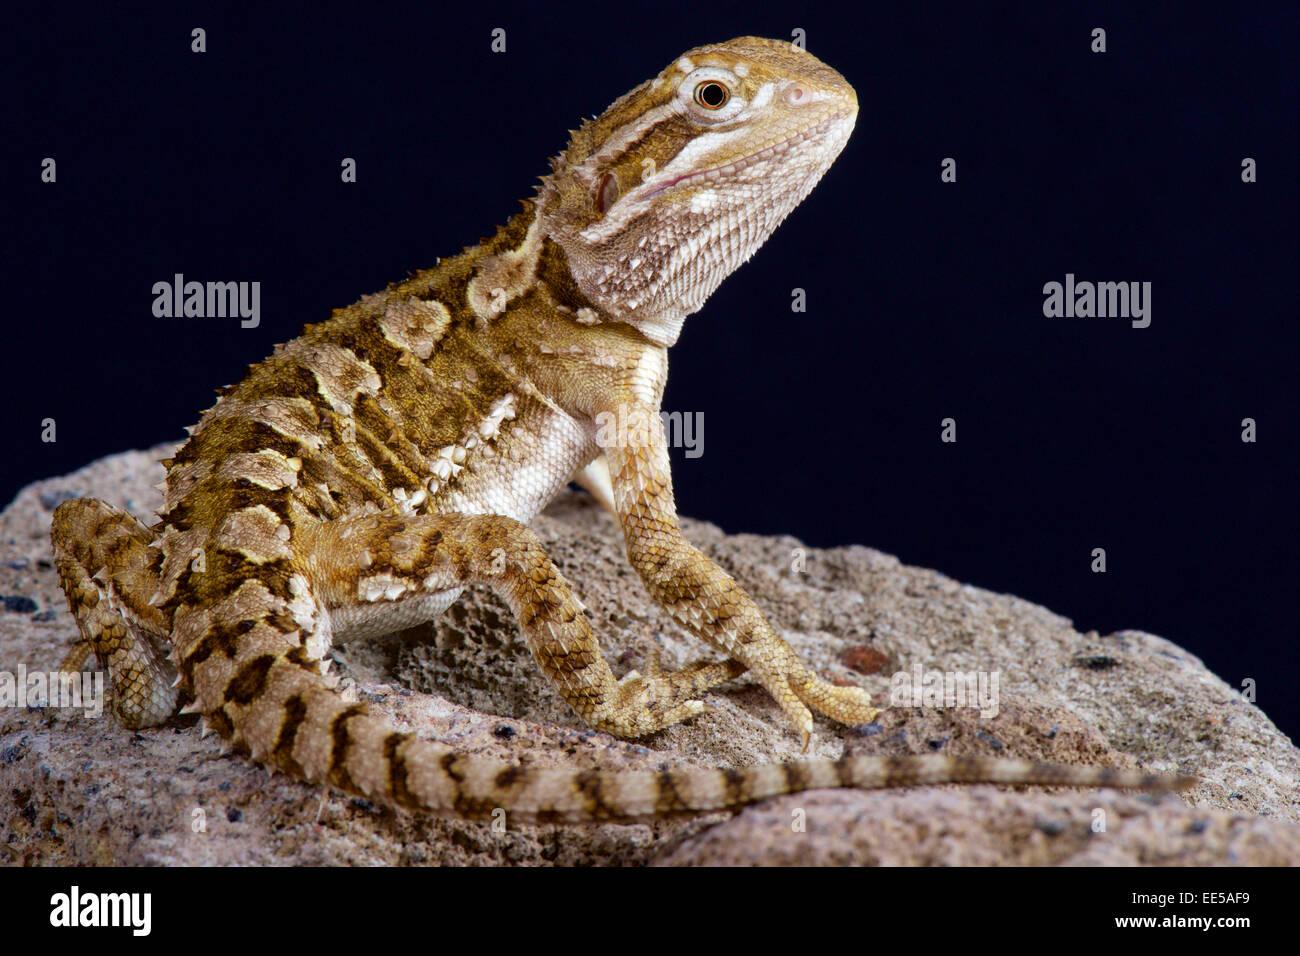 Dwarf bearded dragon / Pogona henrylawsoni - Stock Image